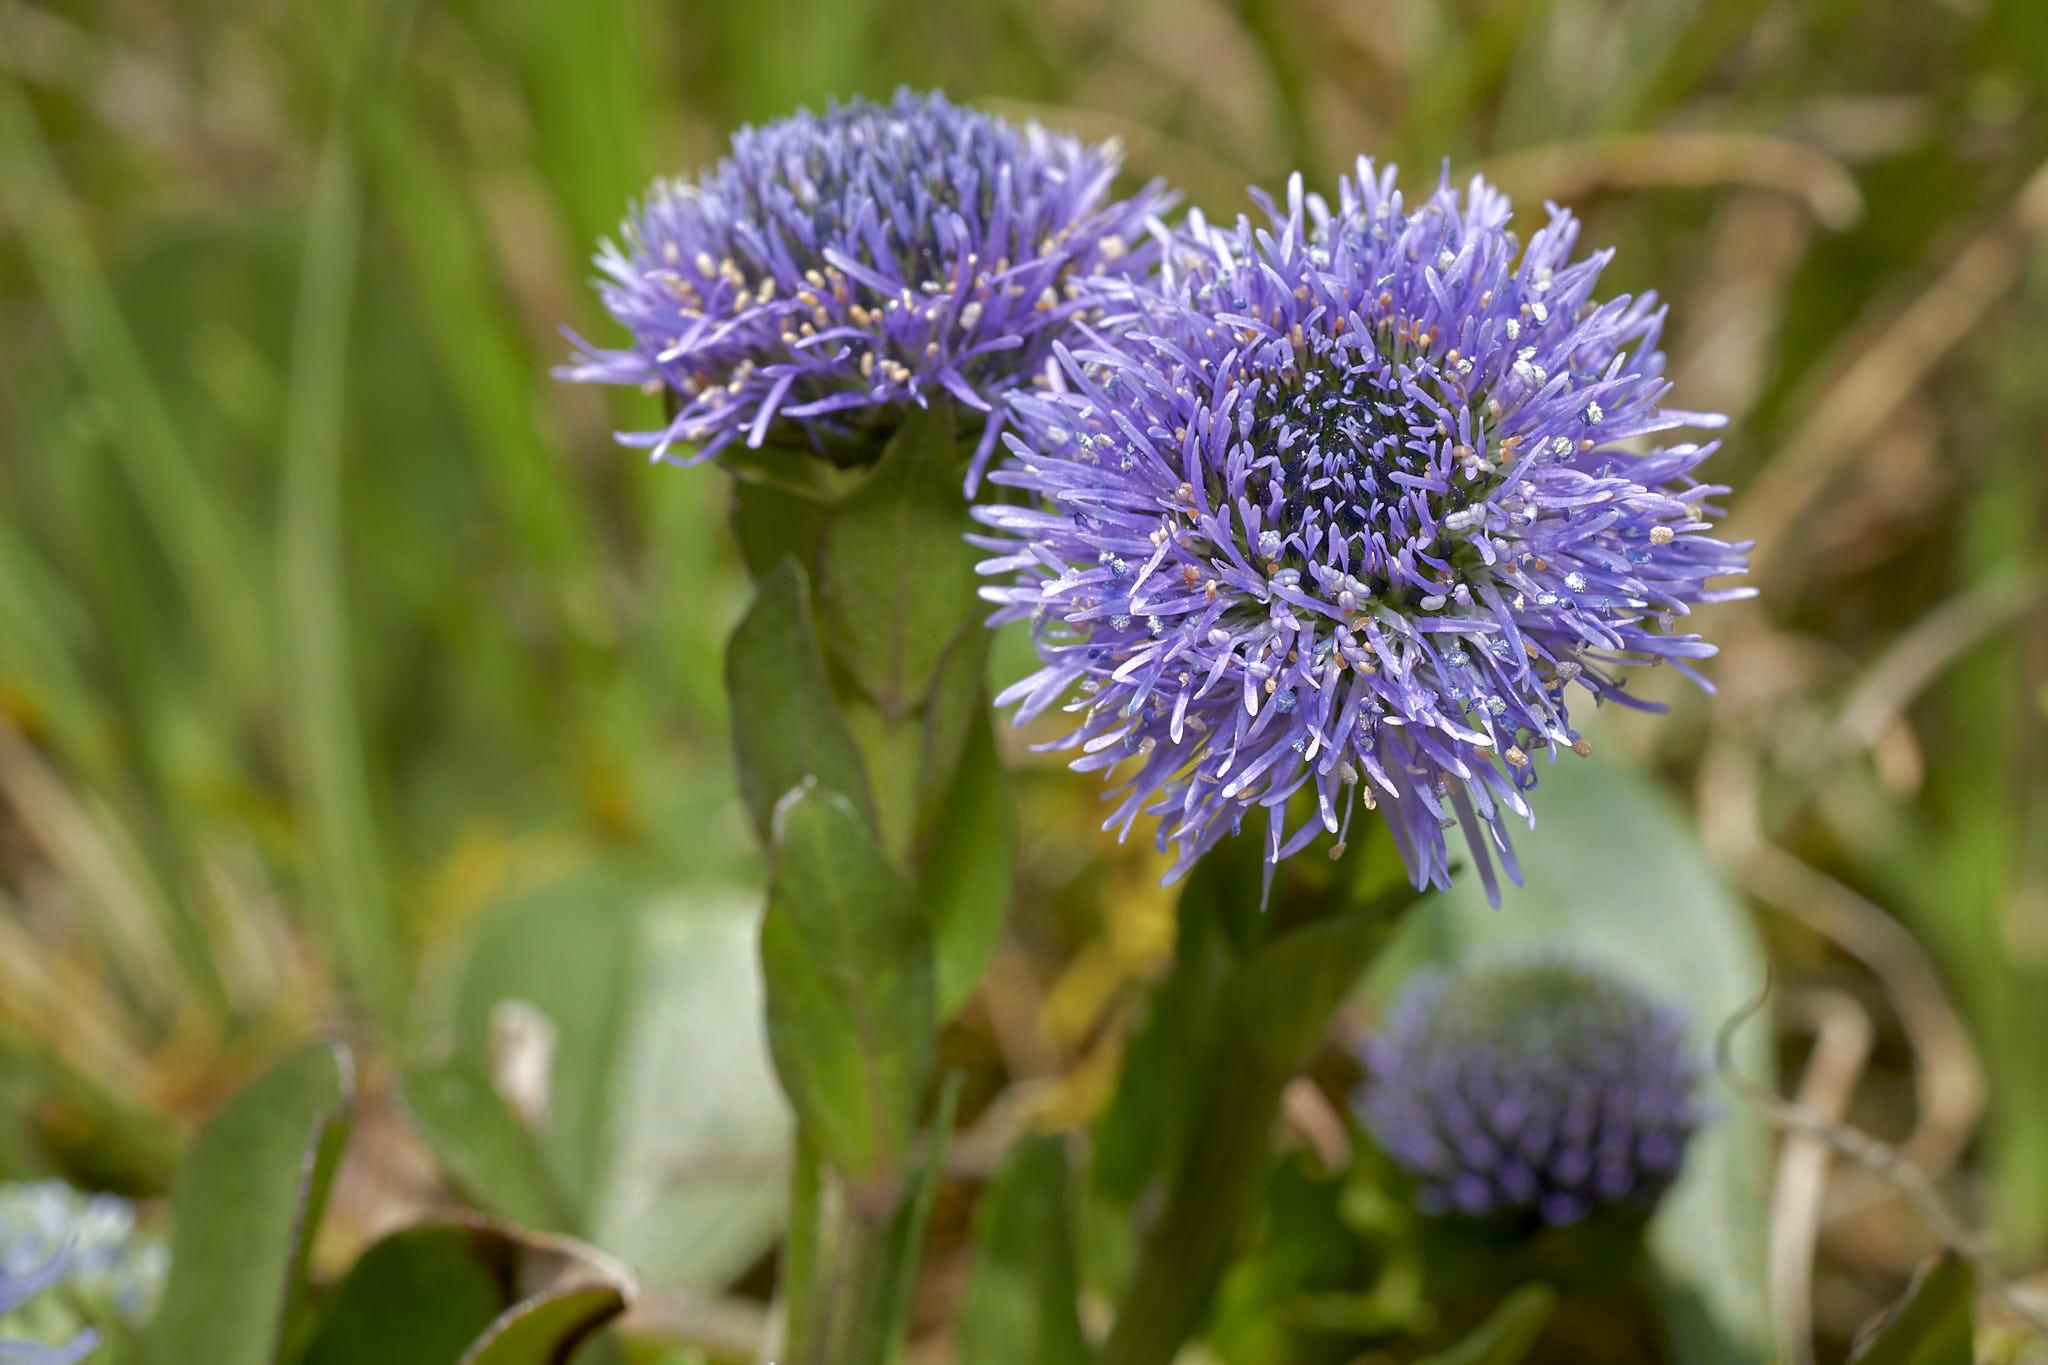 Echte Kugelblume (Globularia bisnagarica)